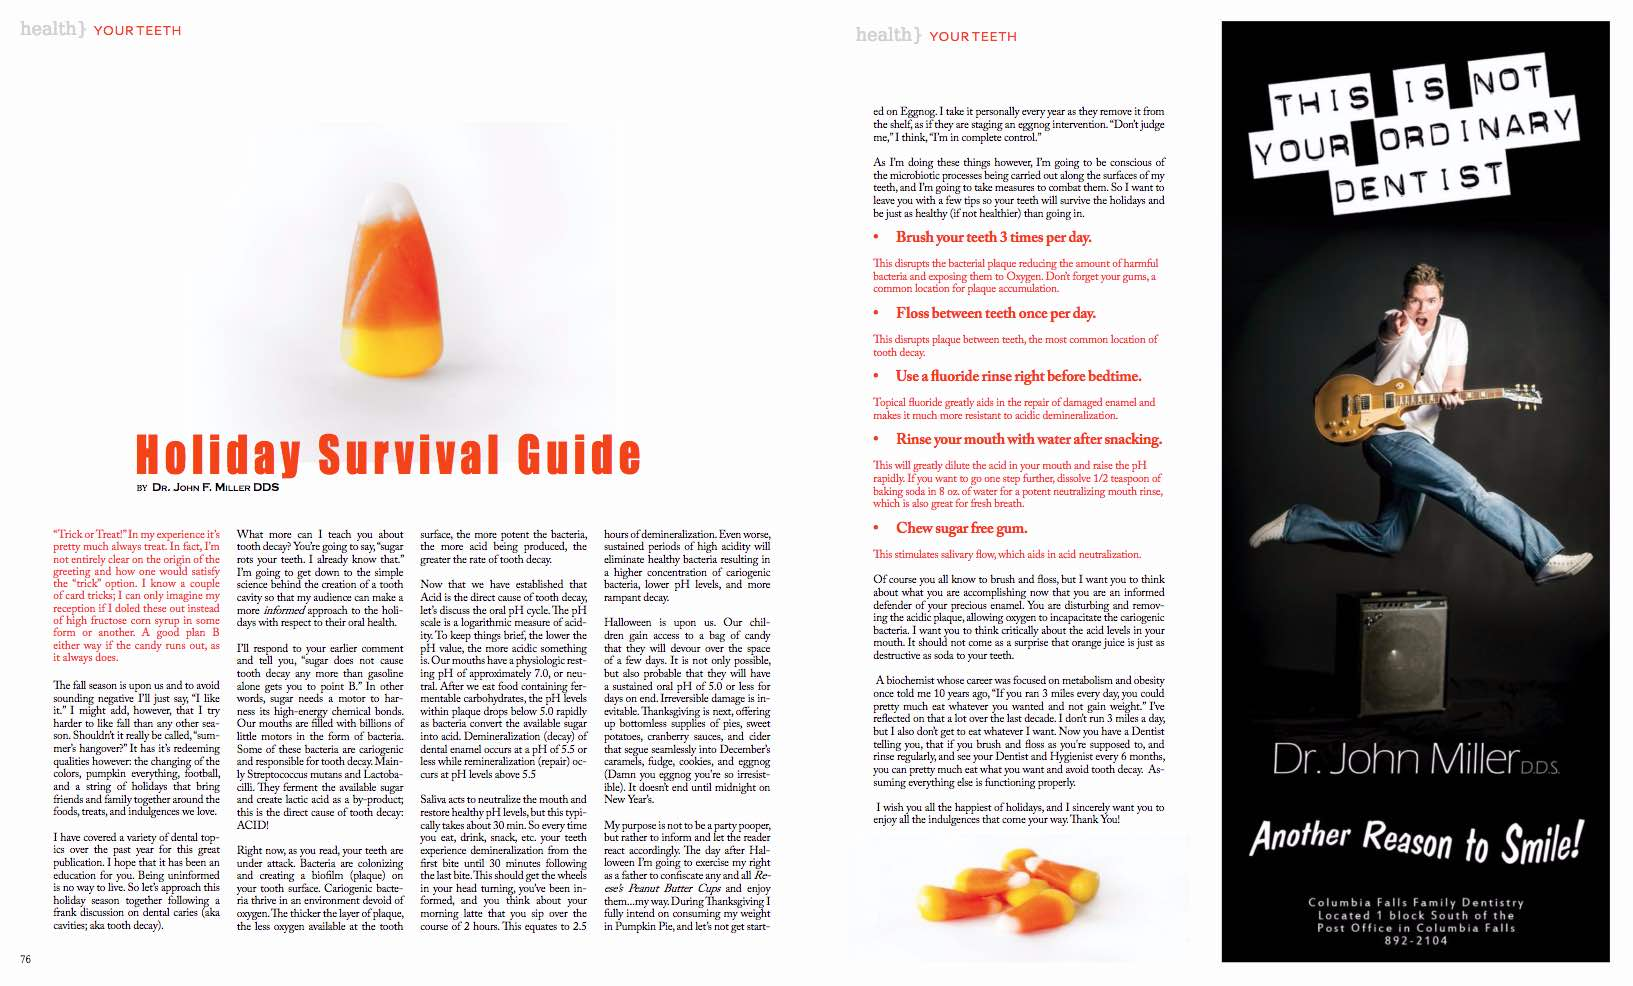 holiday survivial guide.jpg